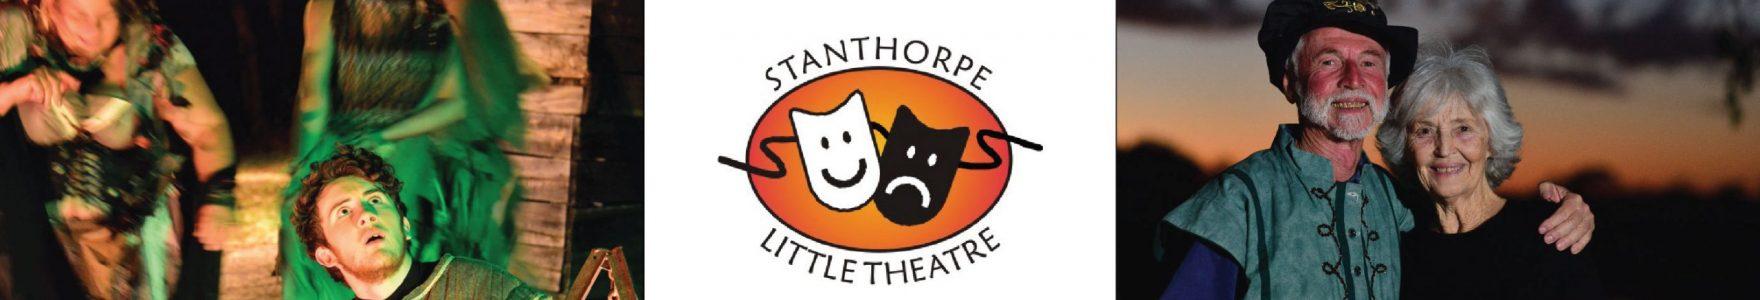 Stanthorpe Little Theatre